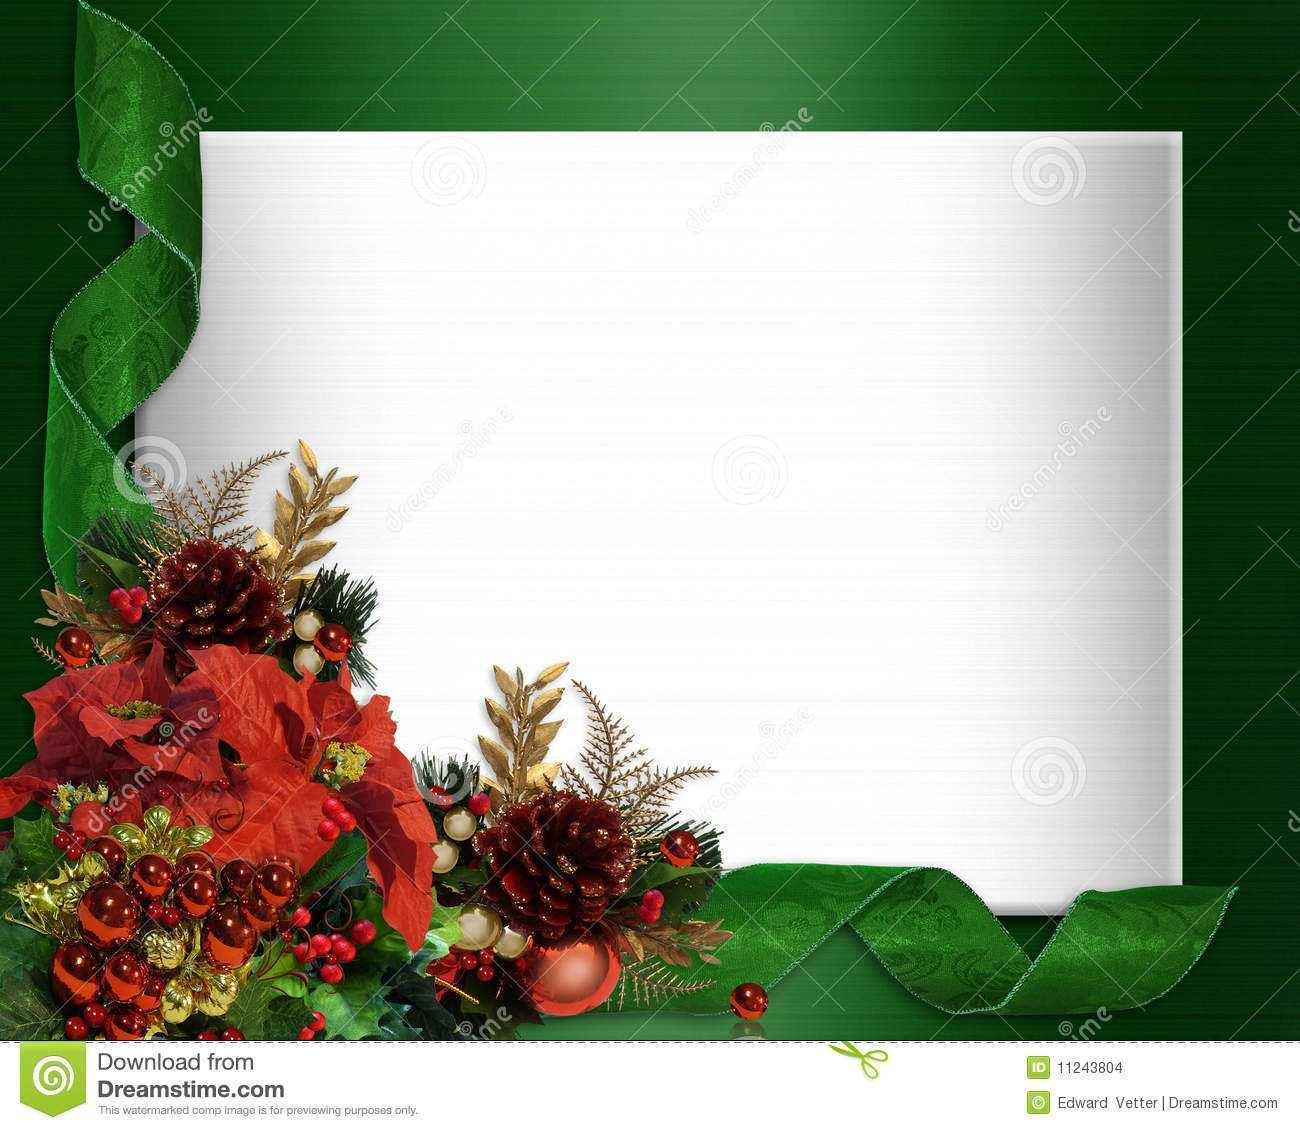 61 Create High Resolution Christmas Card Templates for Ms Word with High Resolution Christmas Card Templates